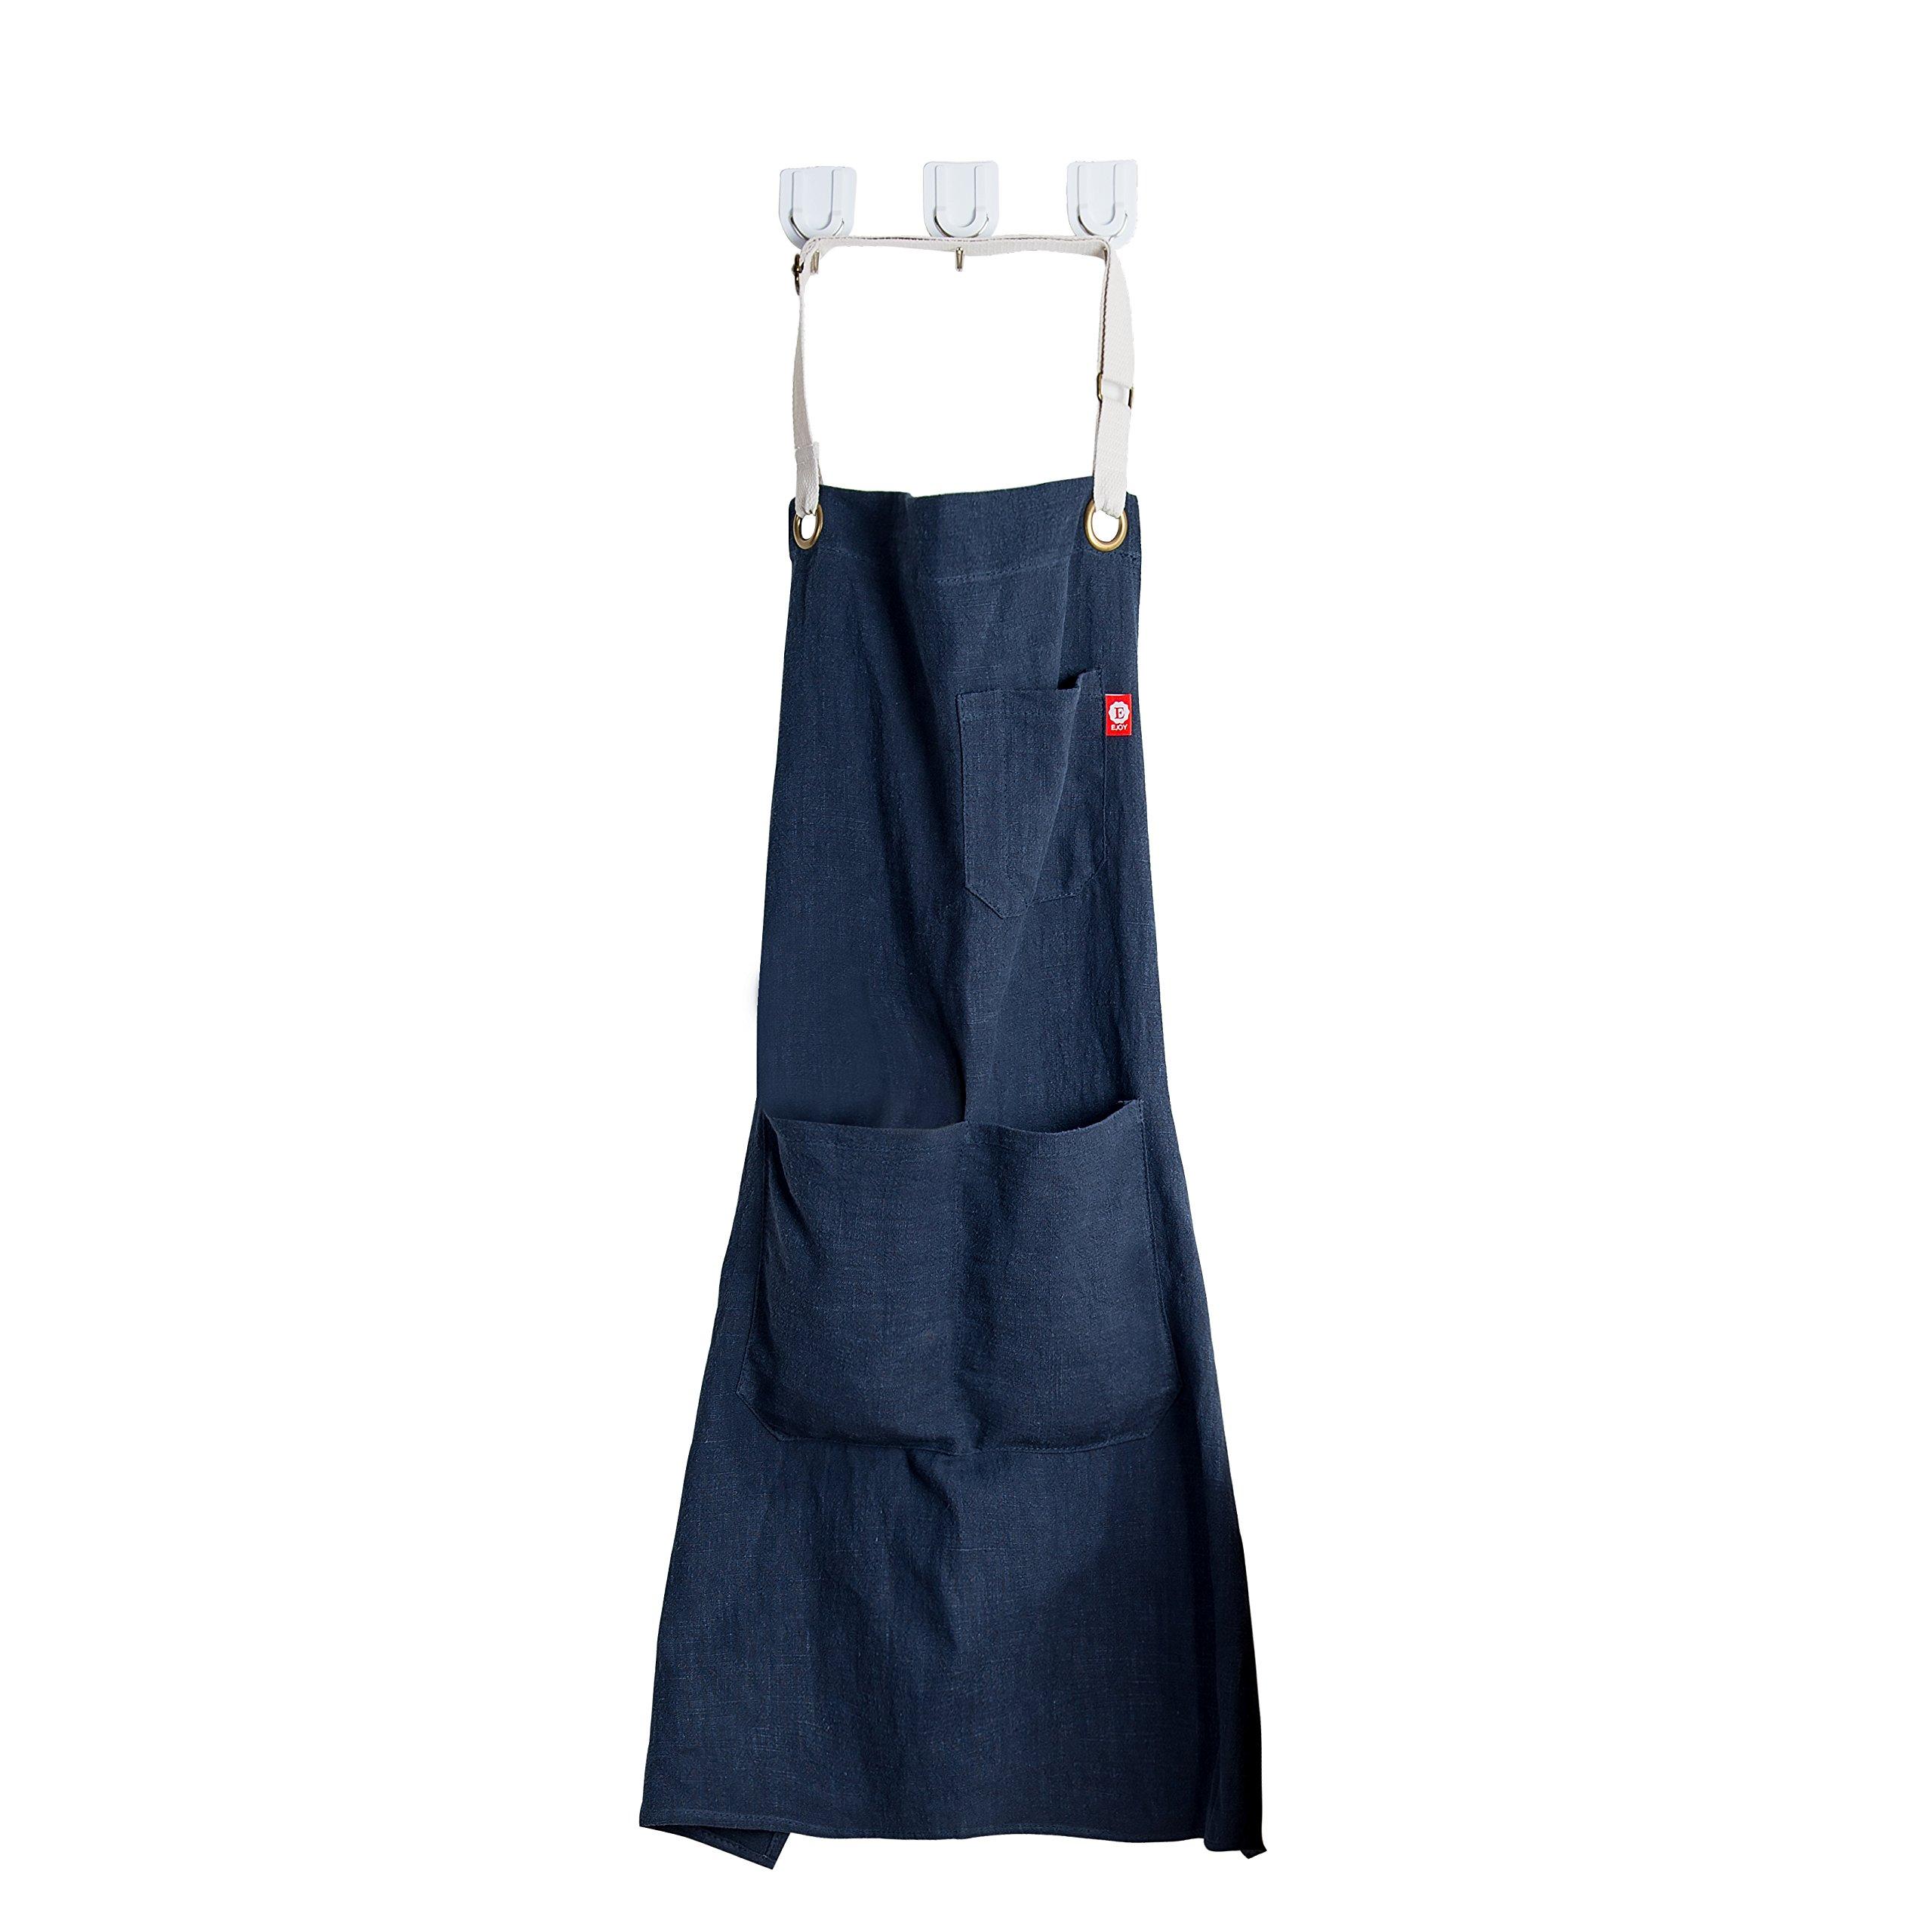 EJoy Linen Kitchen Apron - Mens and Women Linen Apron - Adjustable with Pockets (Dark Blue)